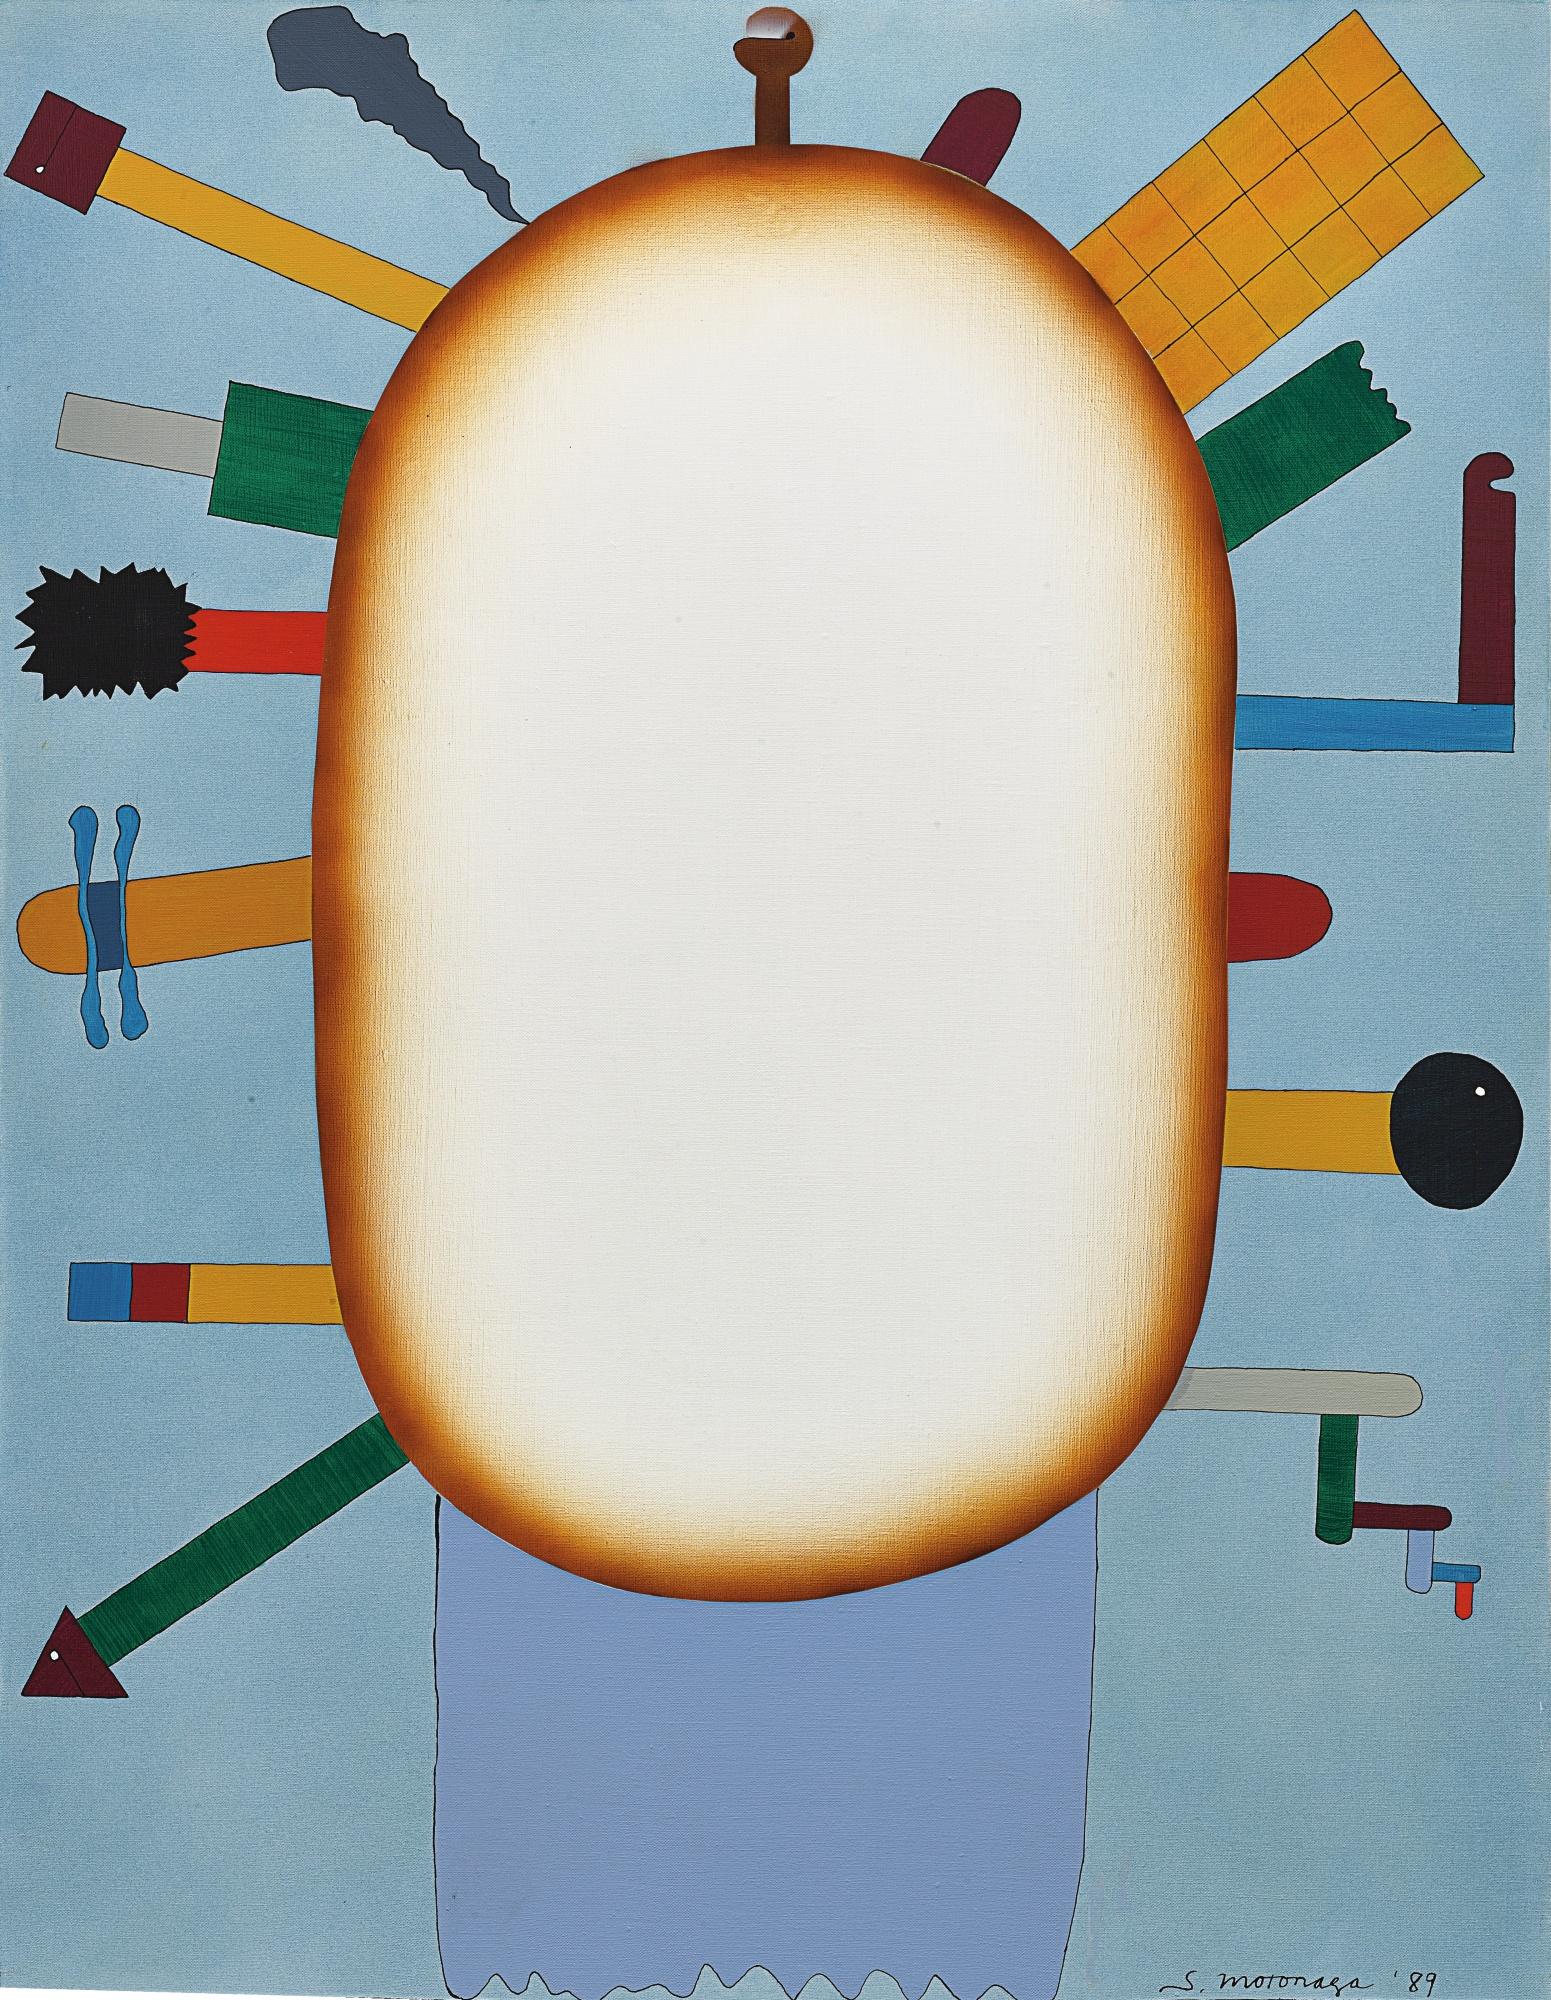 Sadamasa Motonaga-Oval Is Beige, Shapes Are Various-1989